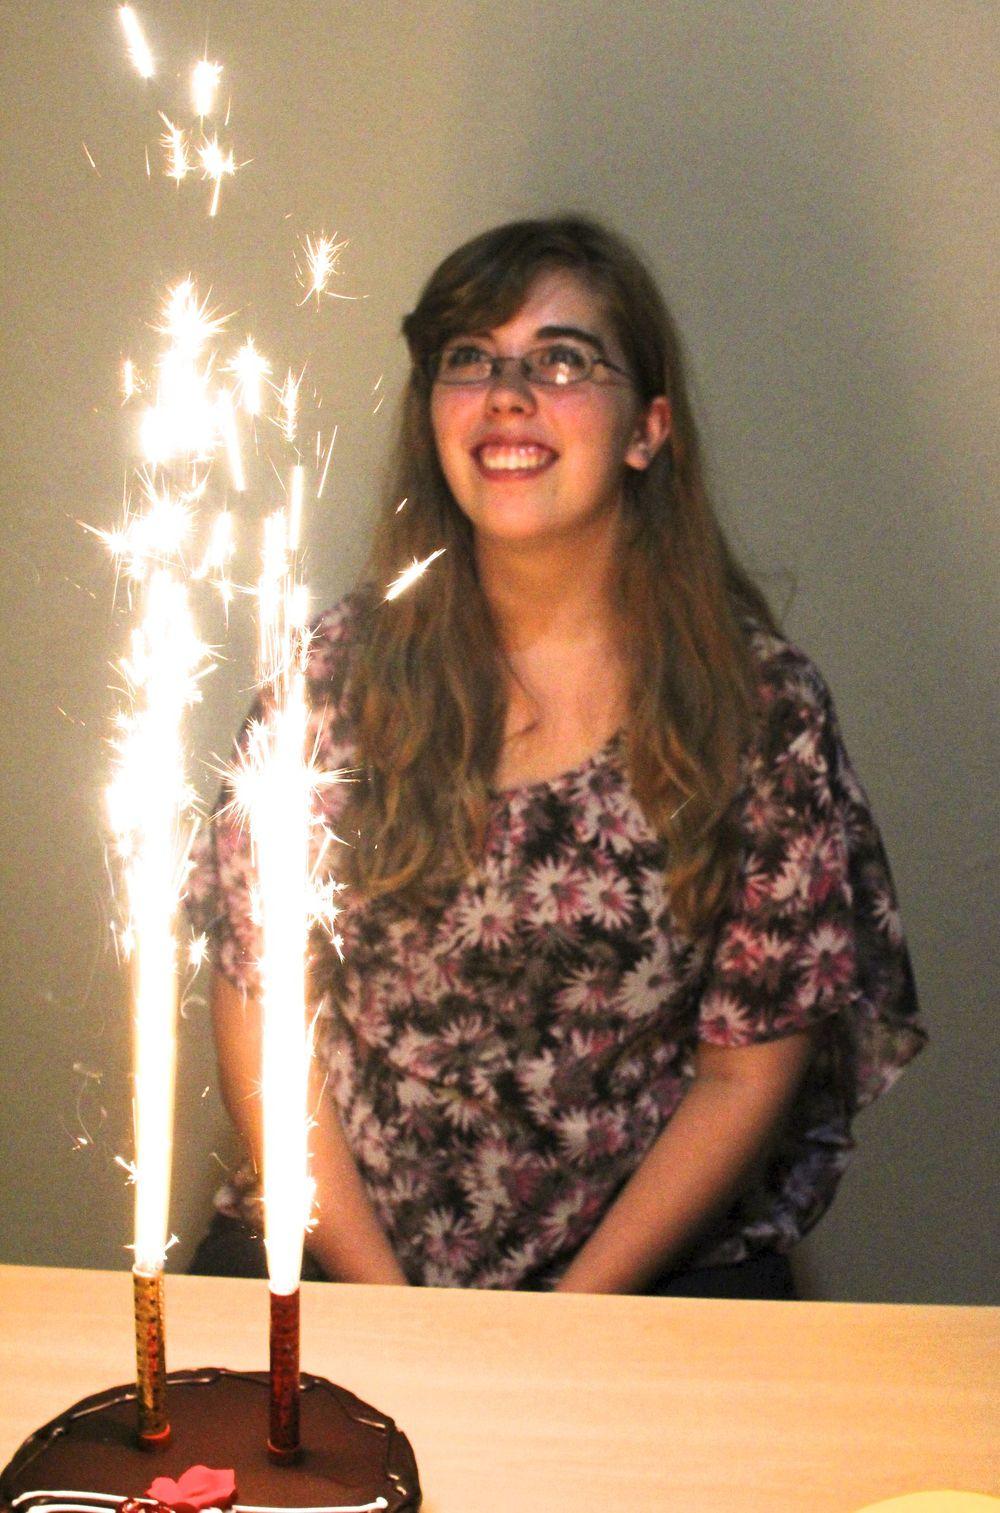 Bethany on her 17th birthday